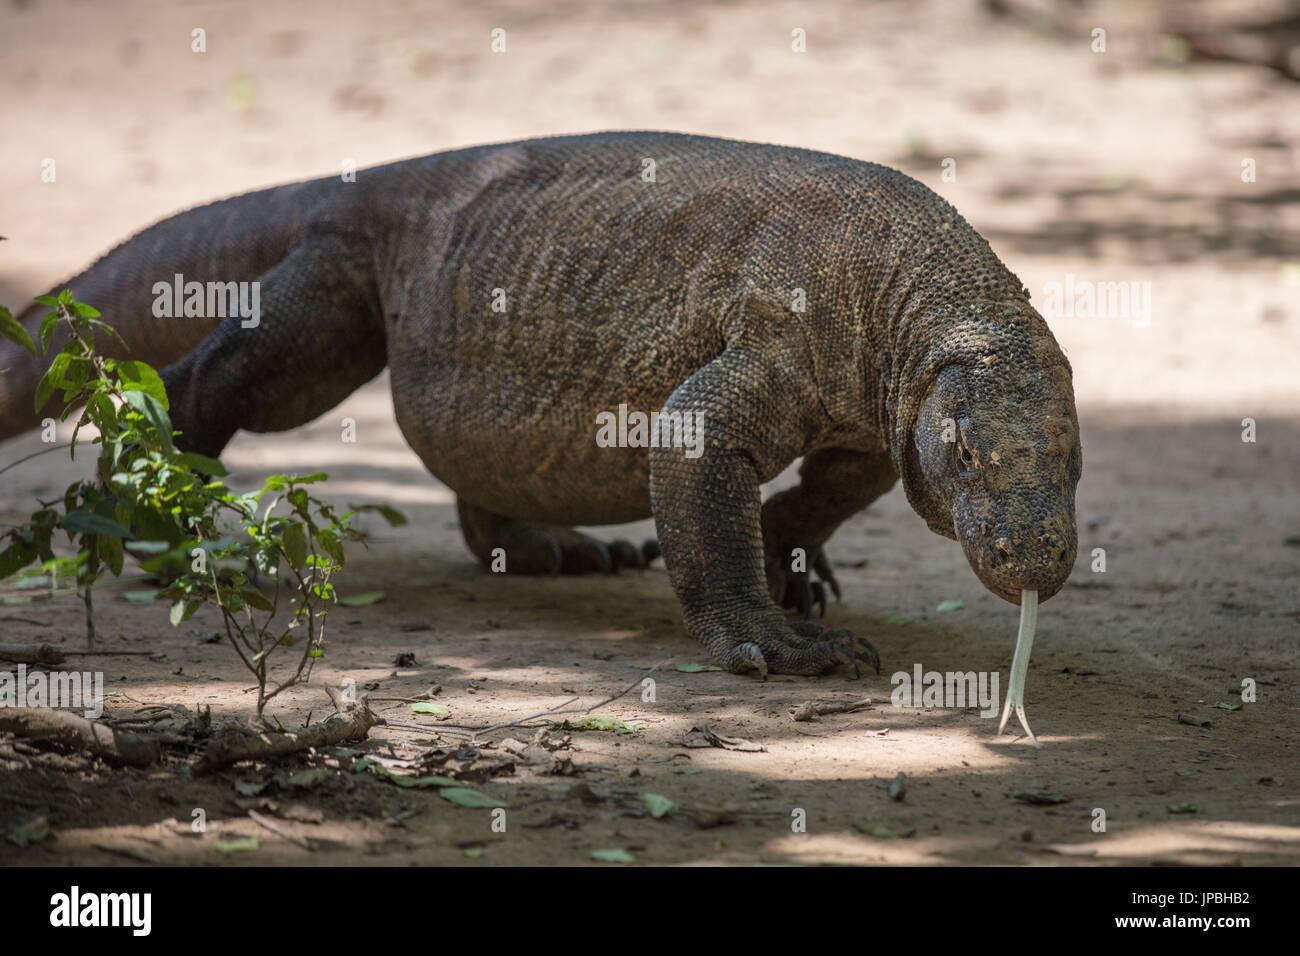 Portrait of a Komodo dragon, Komodo, wildlife, red list, UNESCO, world heritage, Indonesia - Stock Image